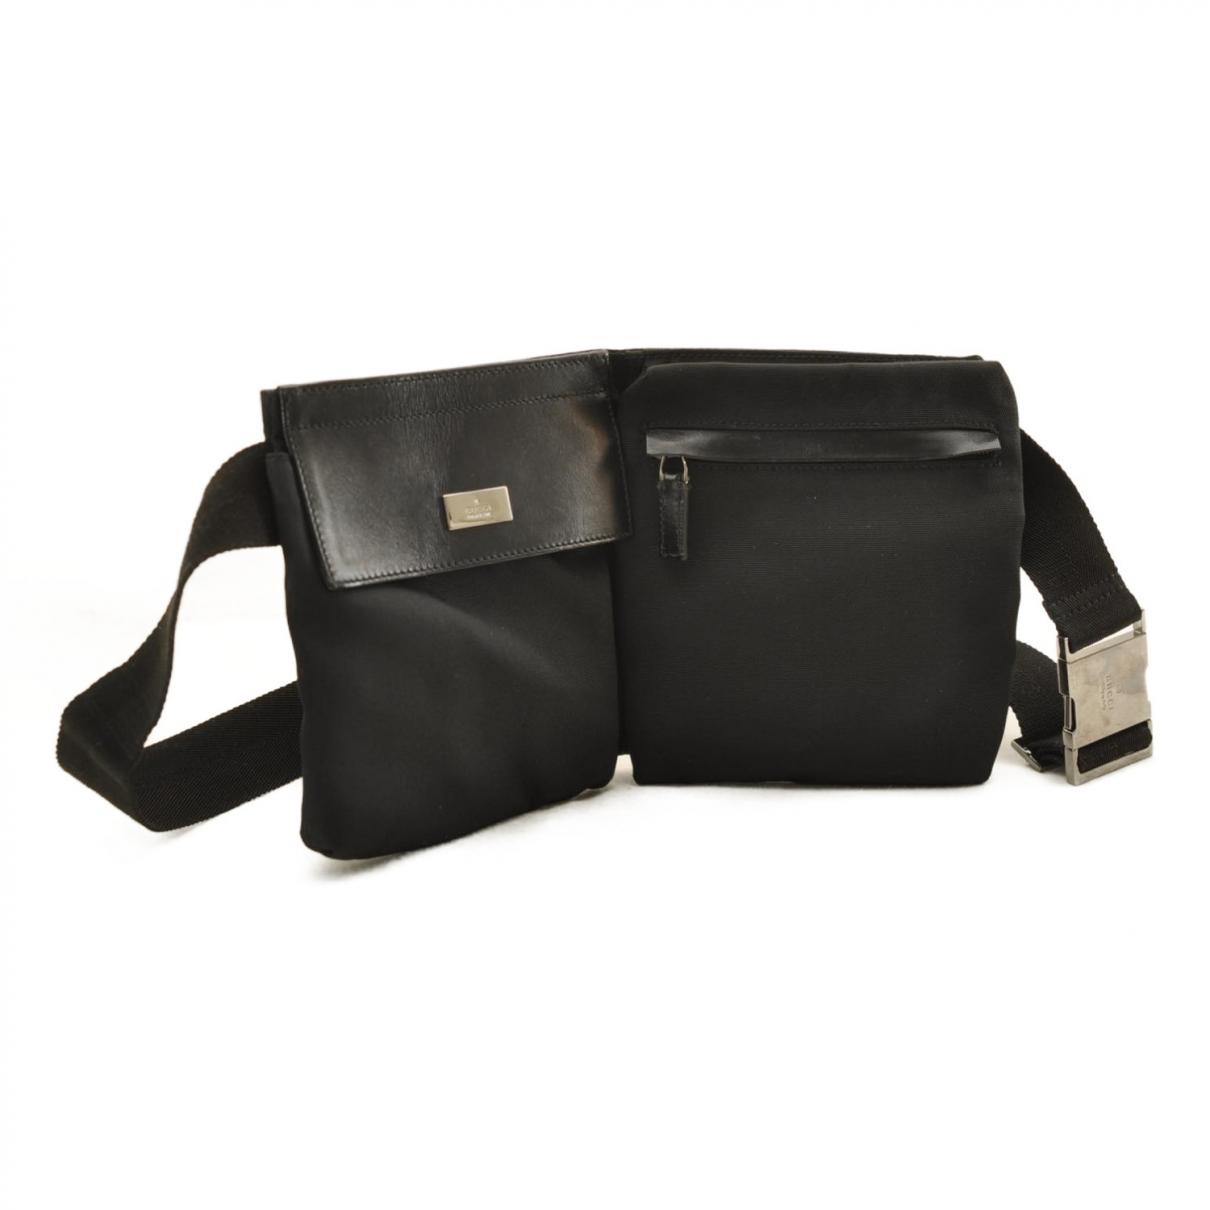 Gucci \N Beige Leather Travel bag for Women \N